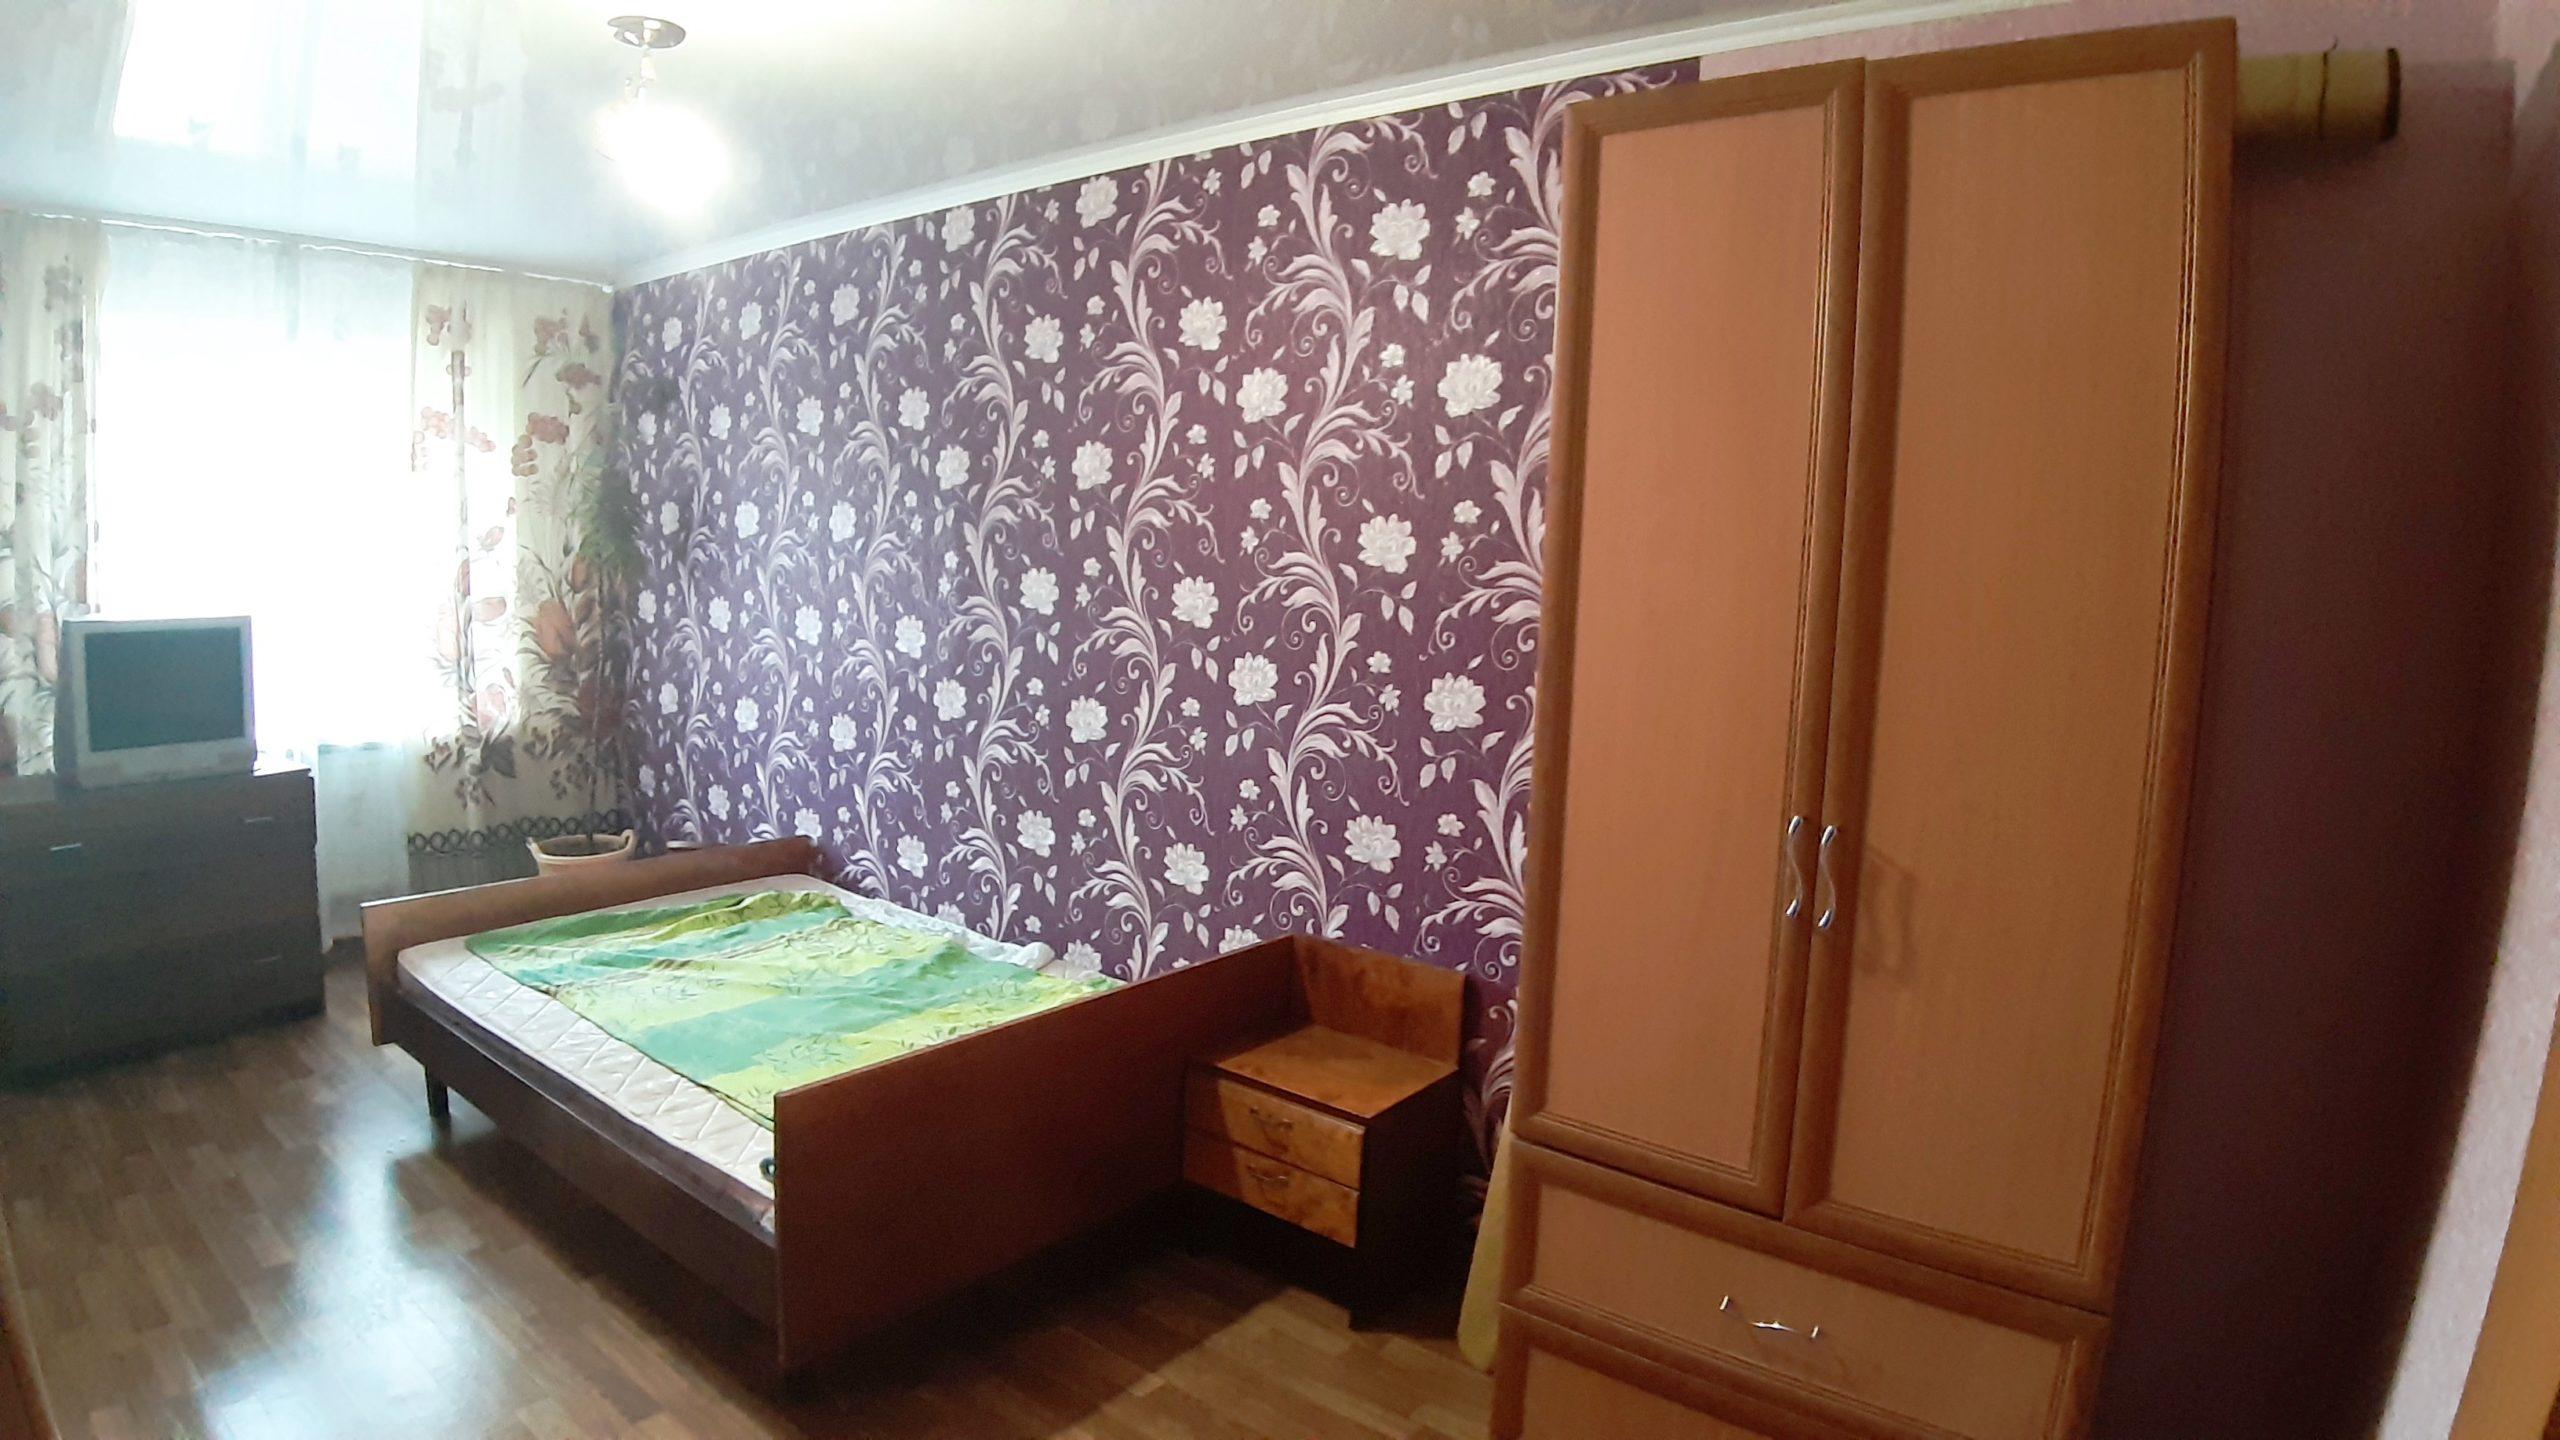 Комната квартира Пятовский Калуга область аренда или продажа